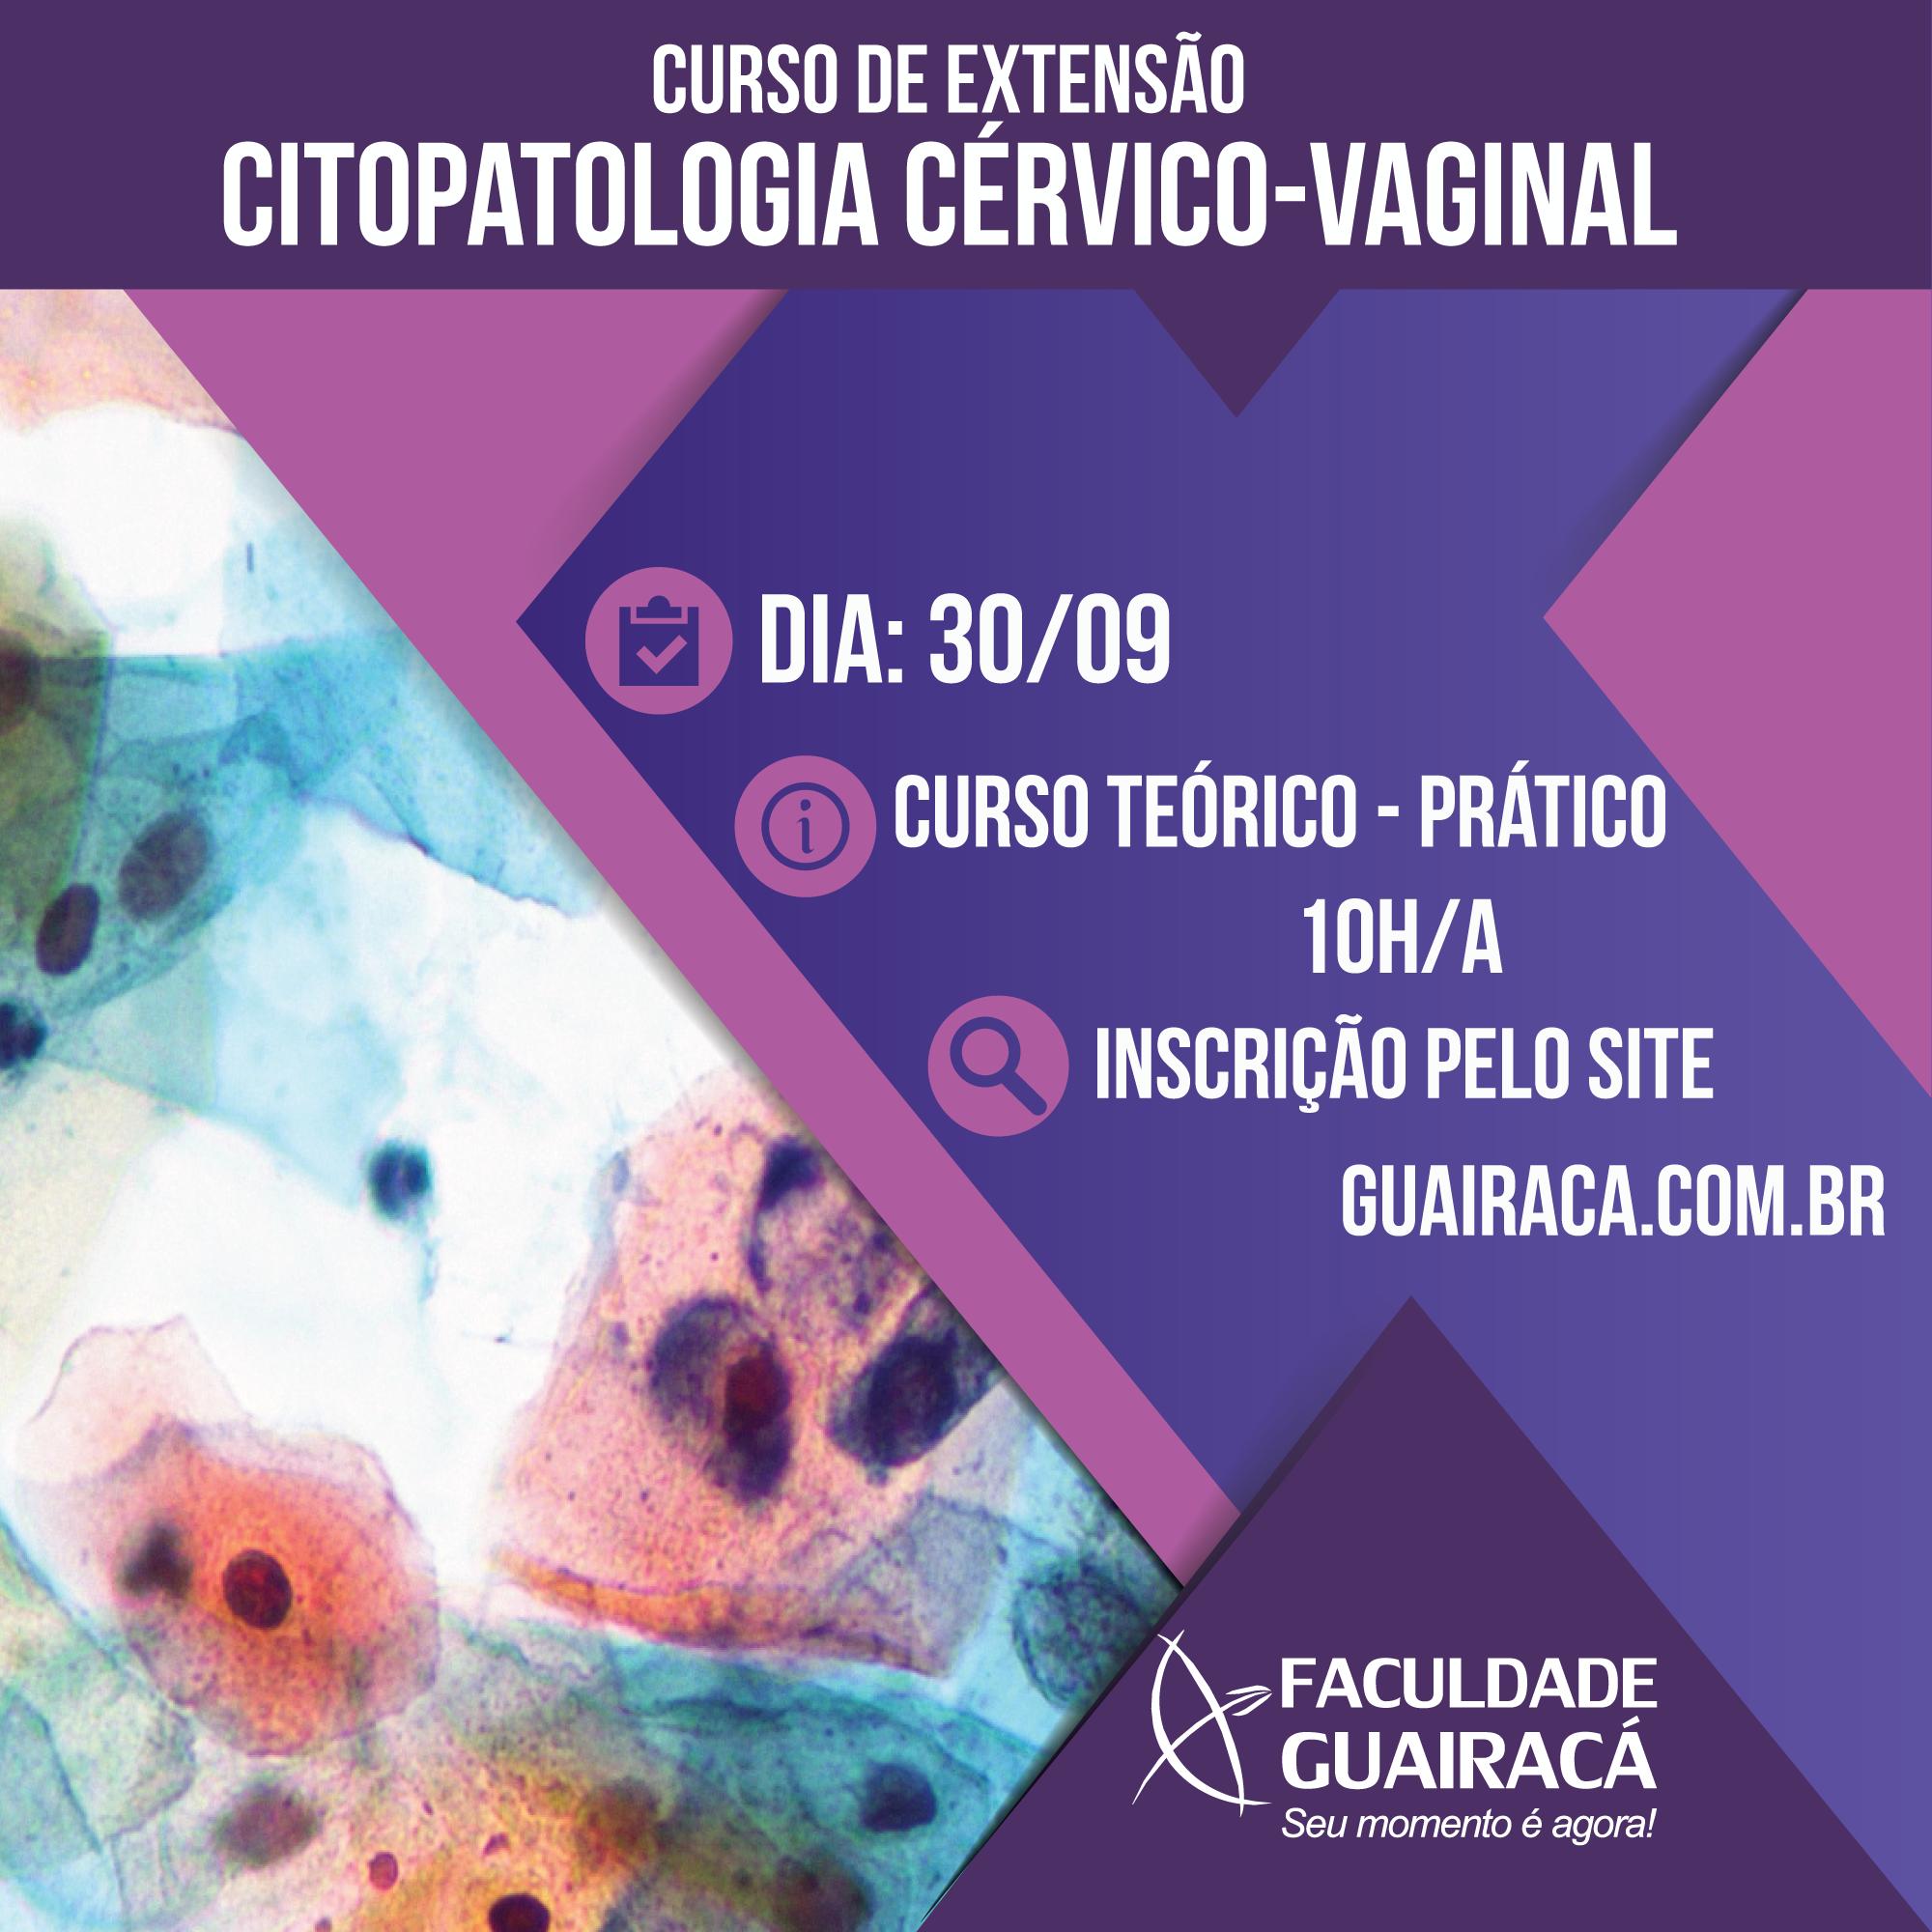 Extencao-Citopatologia-cervico-vaginal